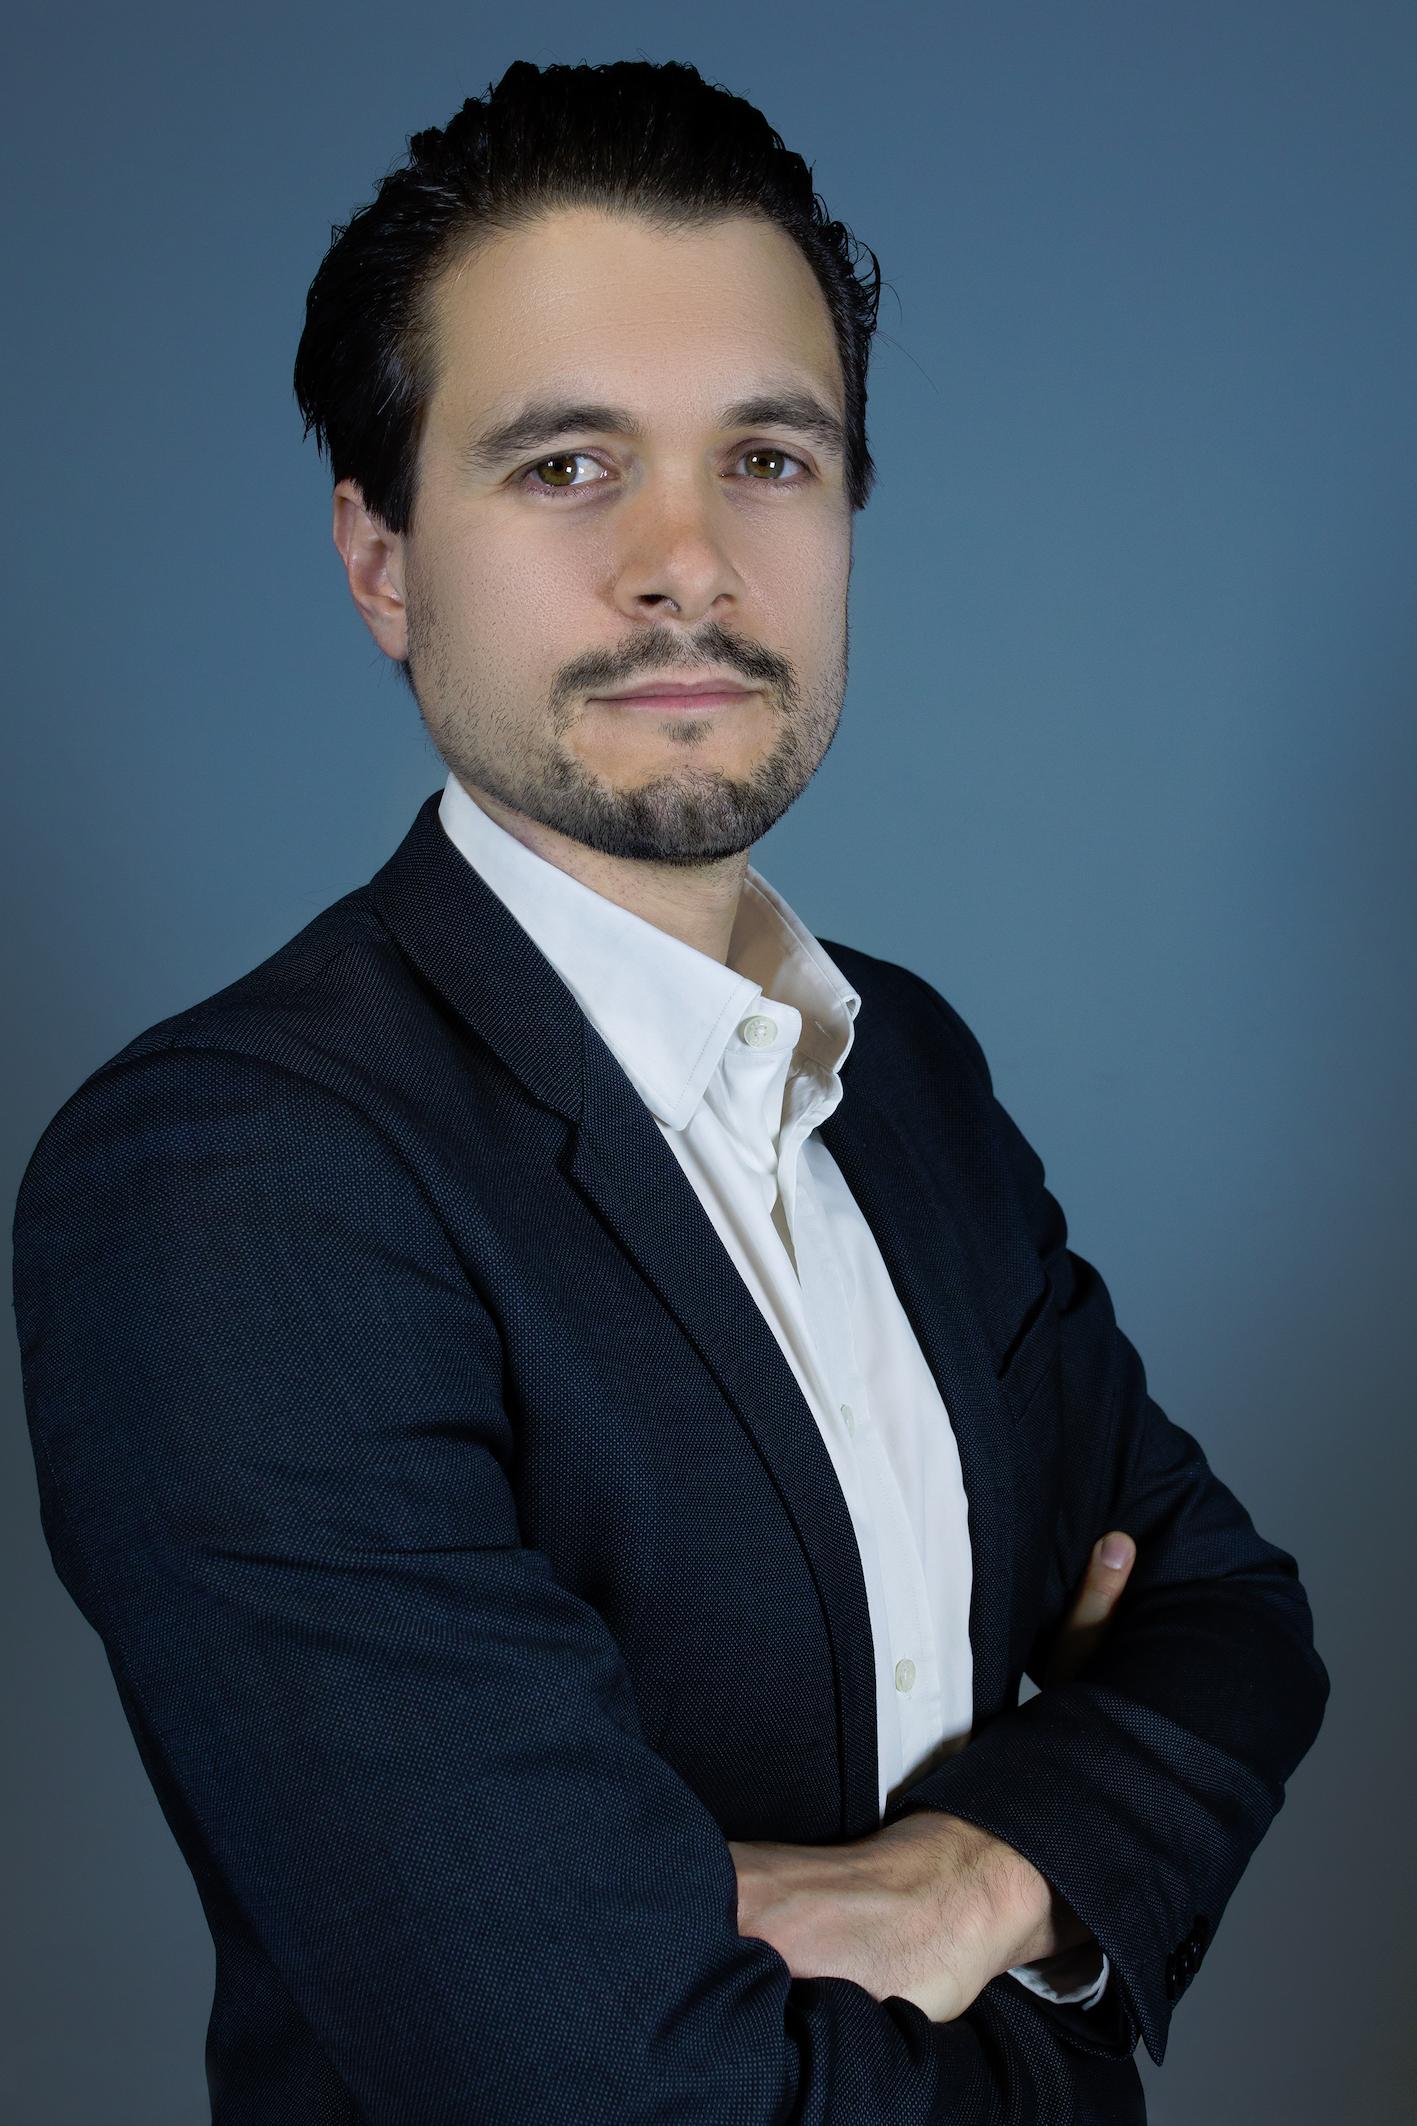 Bertrand Spinelli dirige la régie de Skyrock depuis 2016.